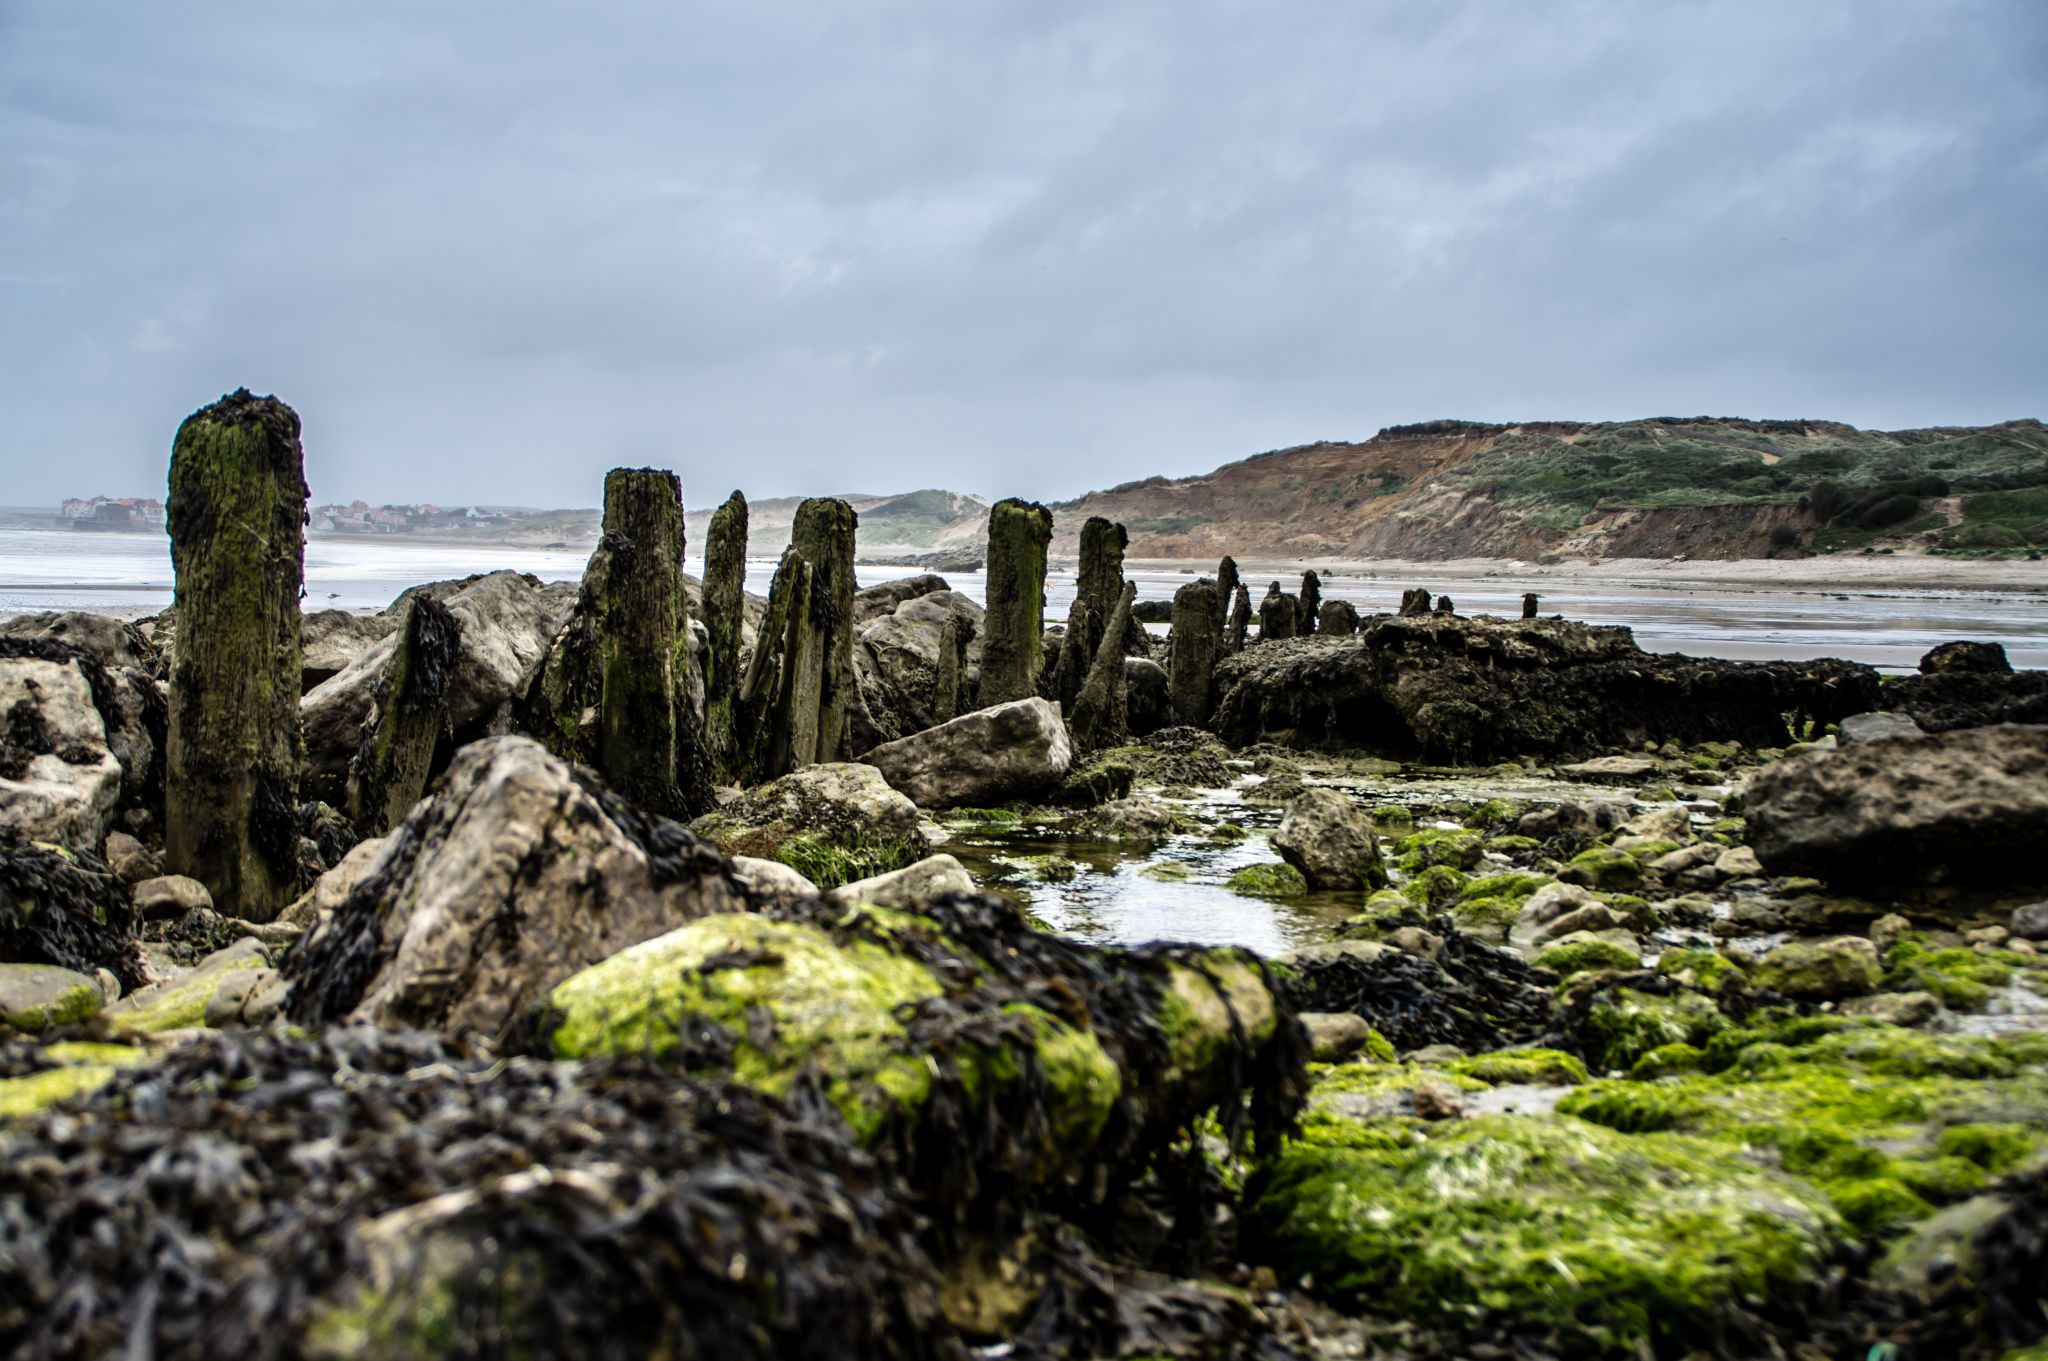 Beach close to Wimereux, France